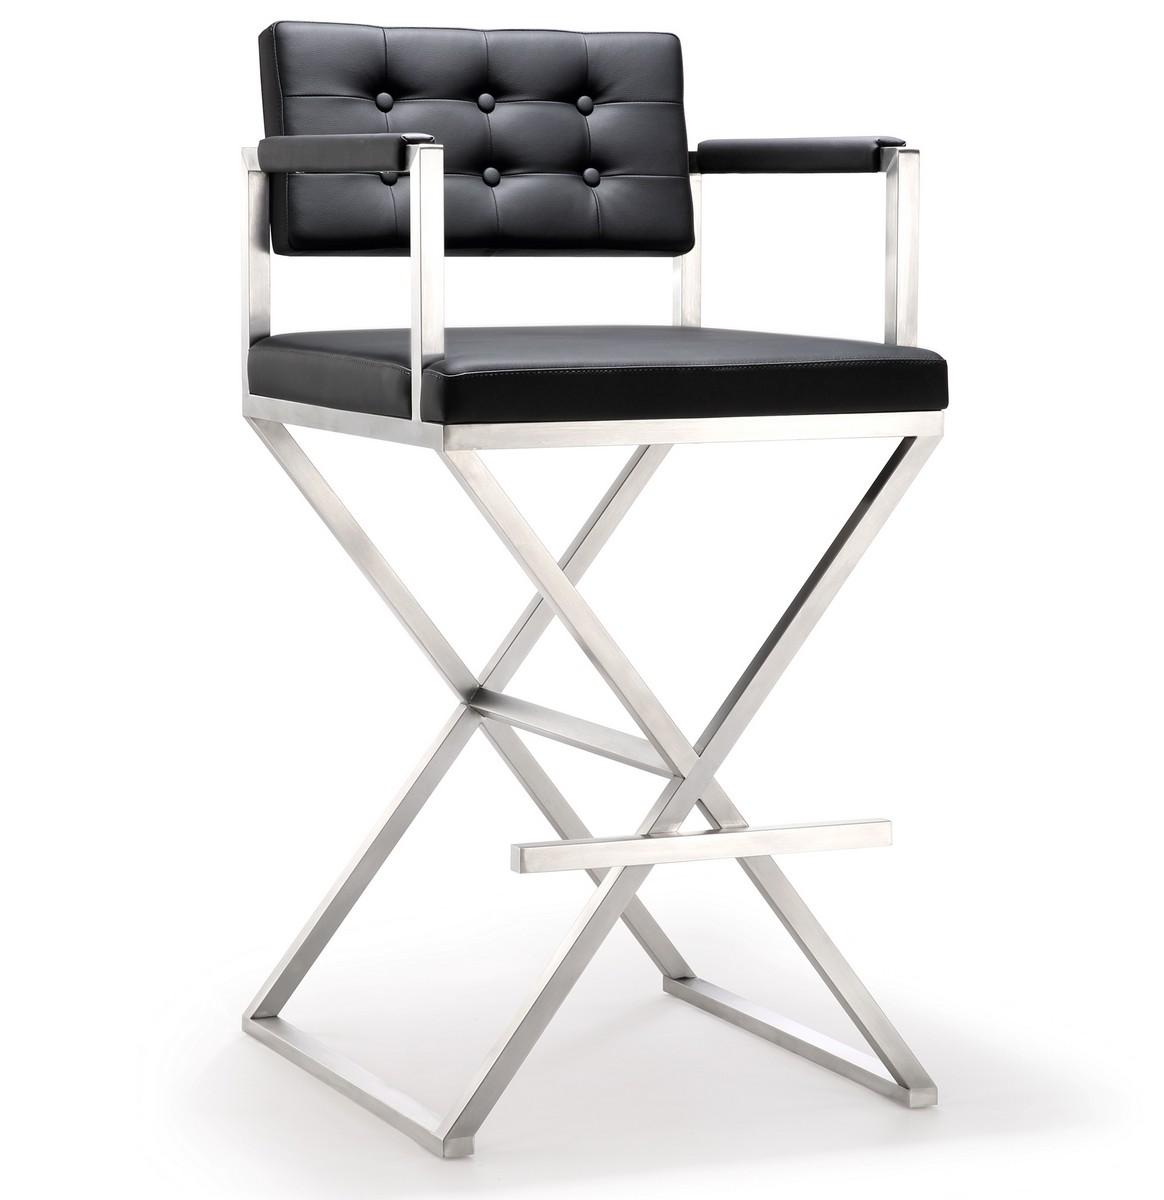 TOV Furniture Director Black Stainless Steel Barstool